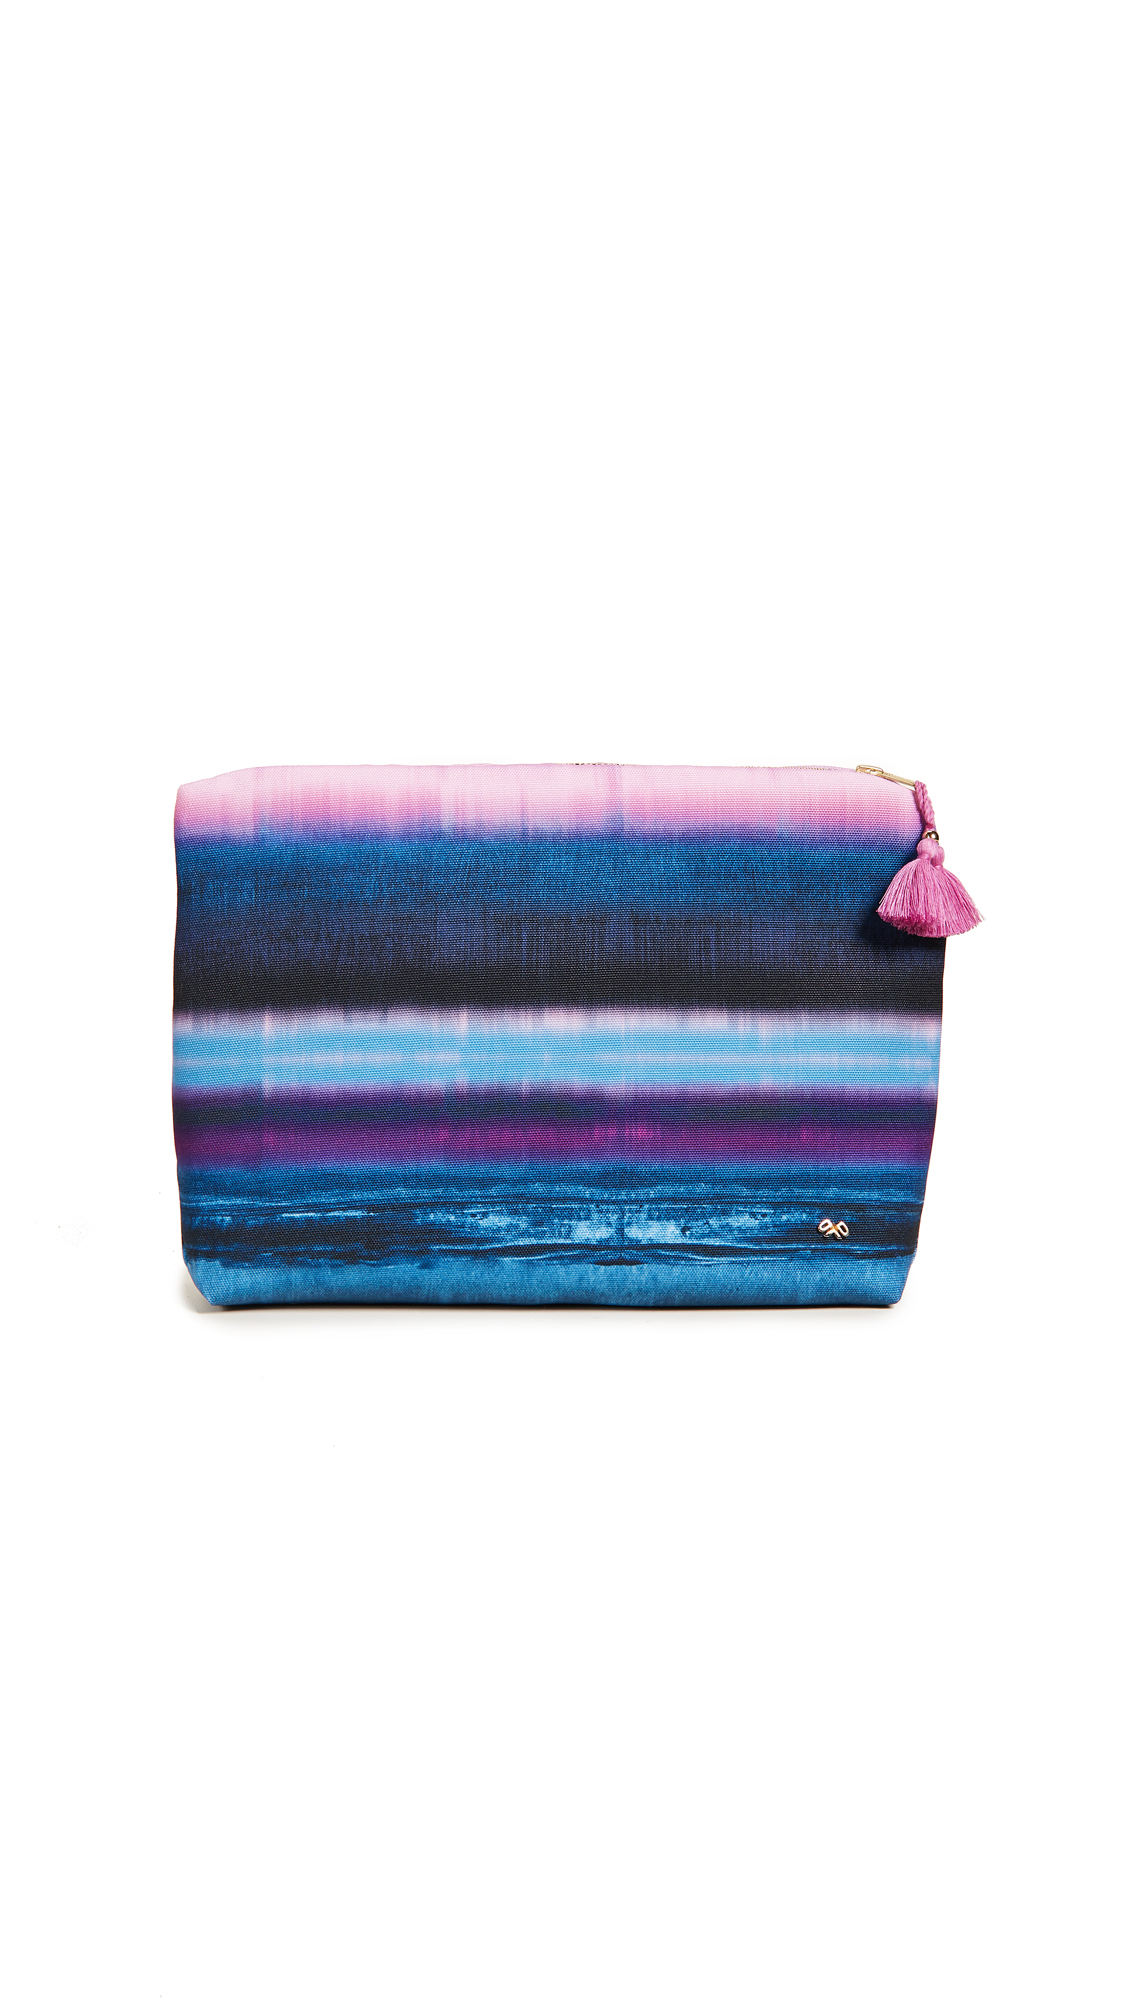 PilyQ Waterproof Pouch - Skyline